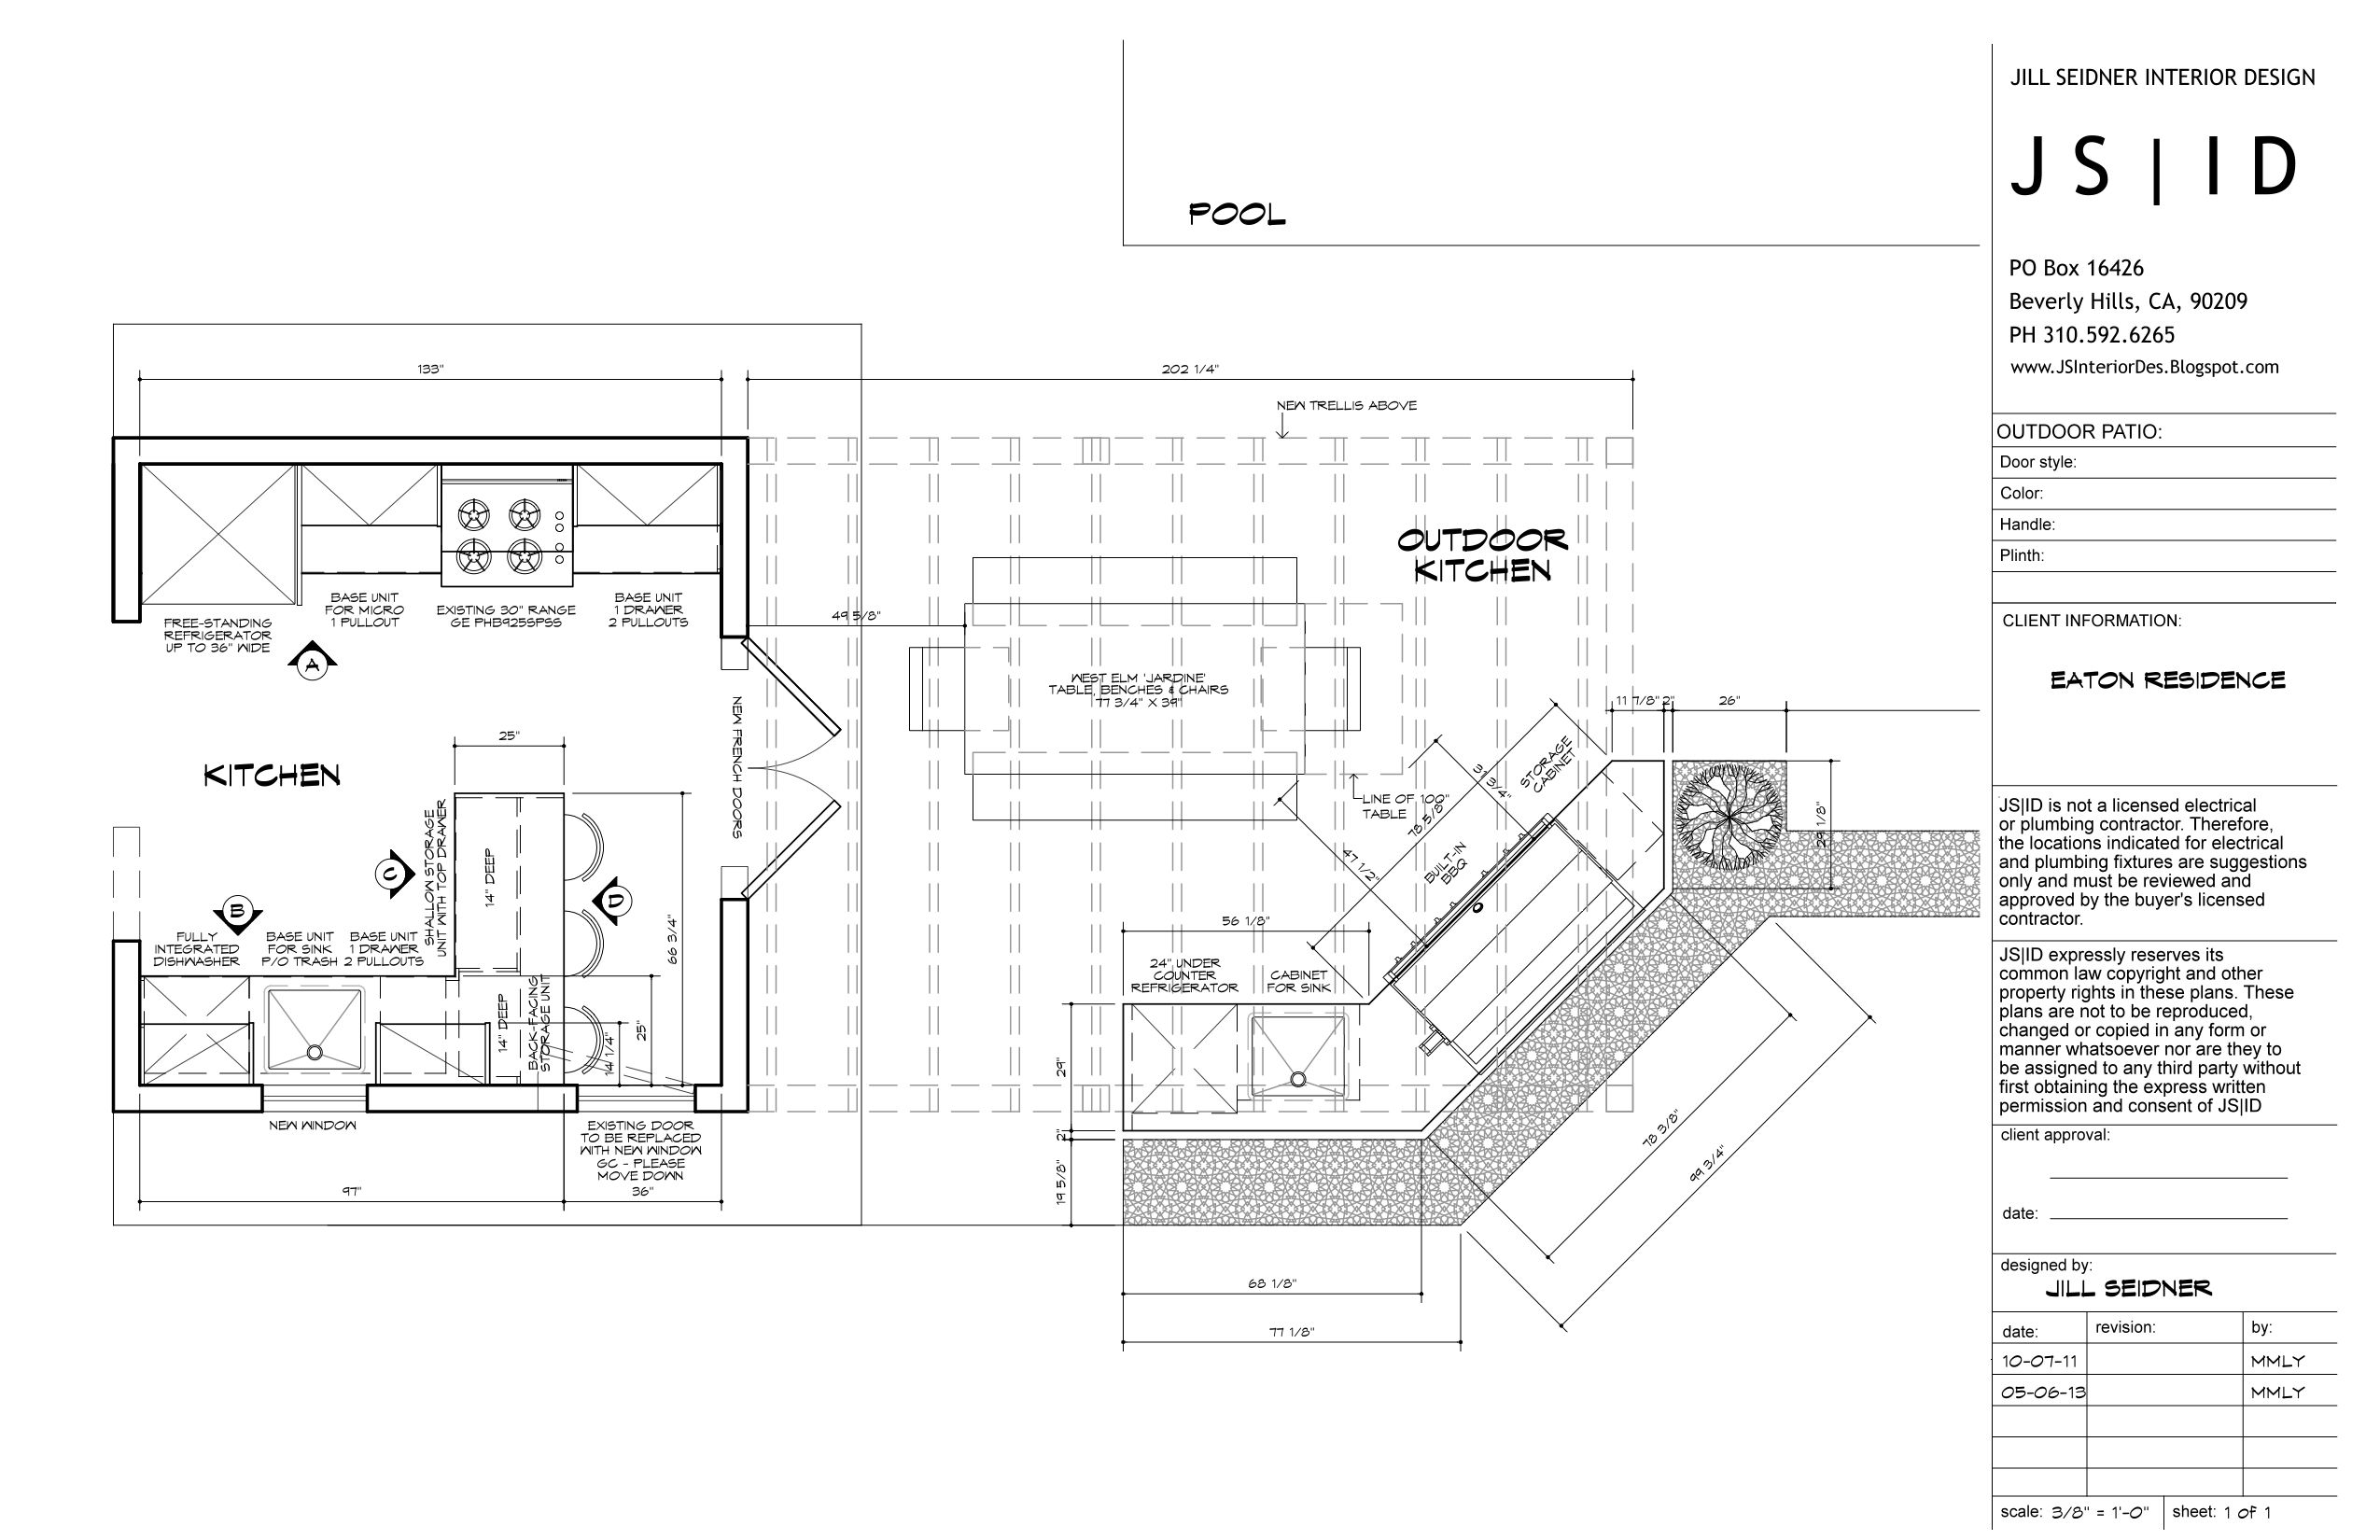 Woodland Hills Ca Residence Kitchen Remodel Outdoor Patio Kitchen Space Planning Layout Outdoor Kitchen Design Outdoor Kitchen Design Layout Outdoor Kitchen